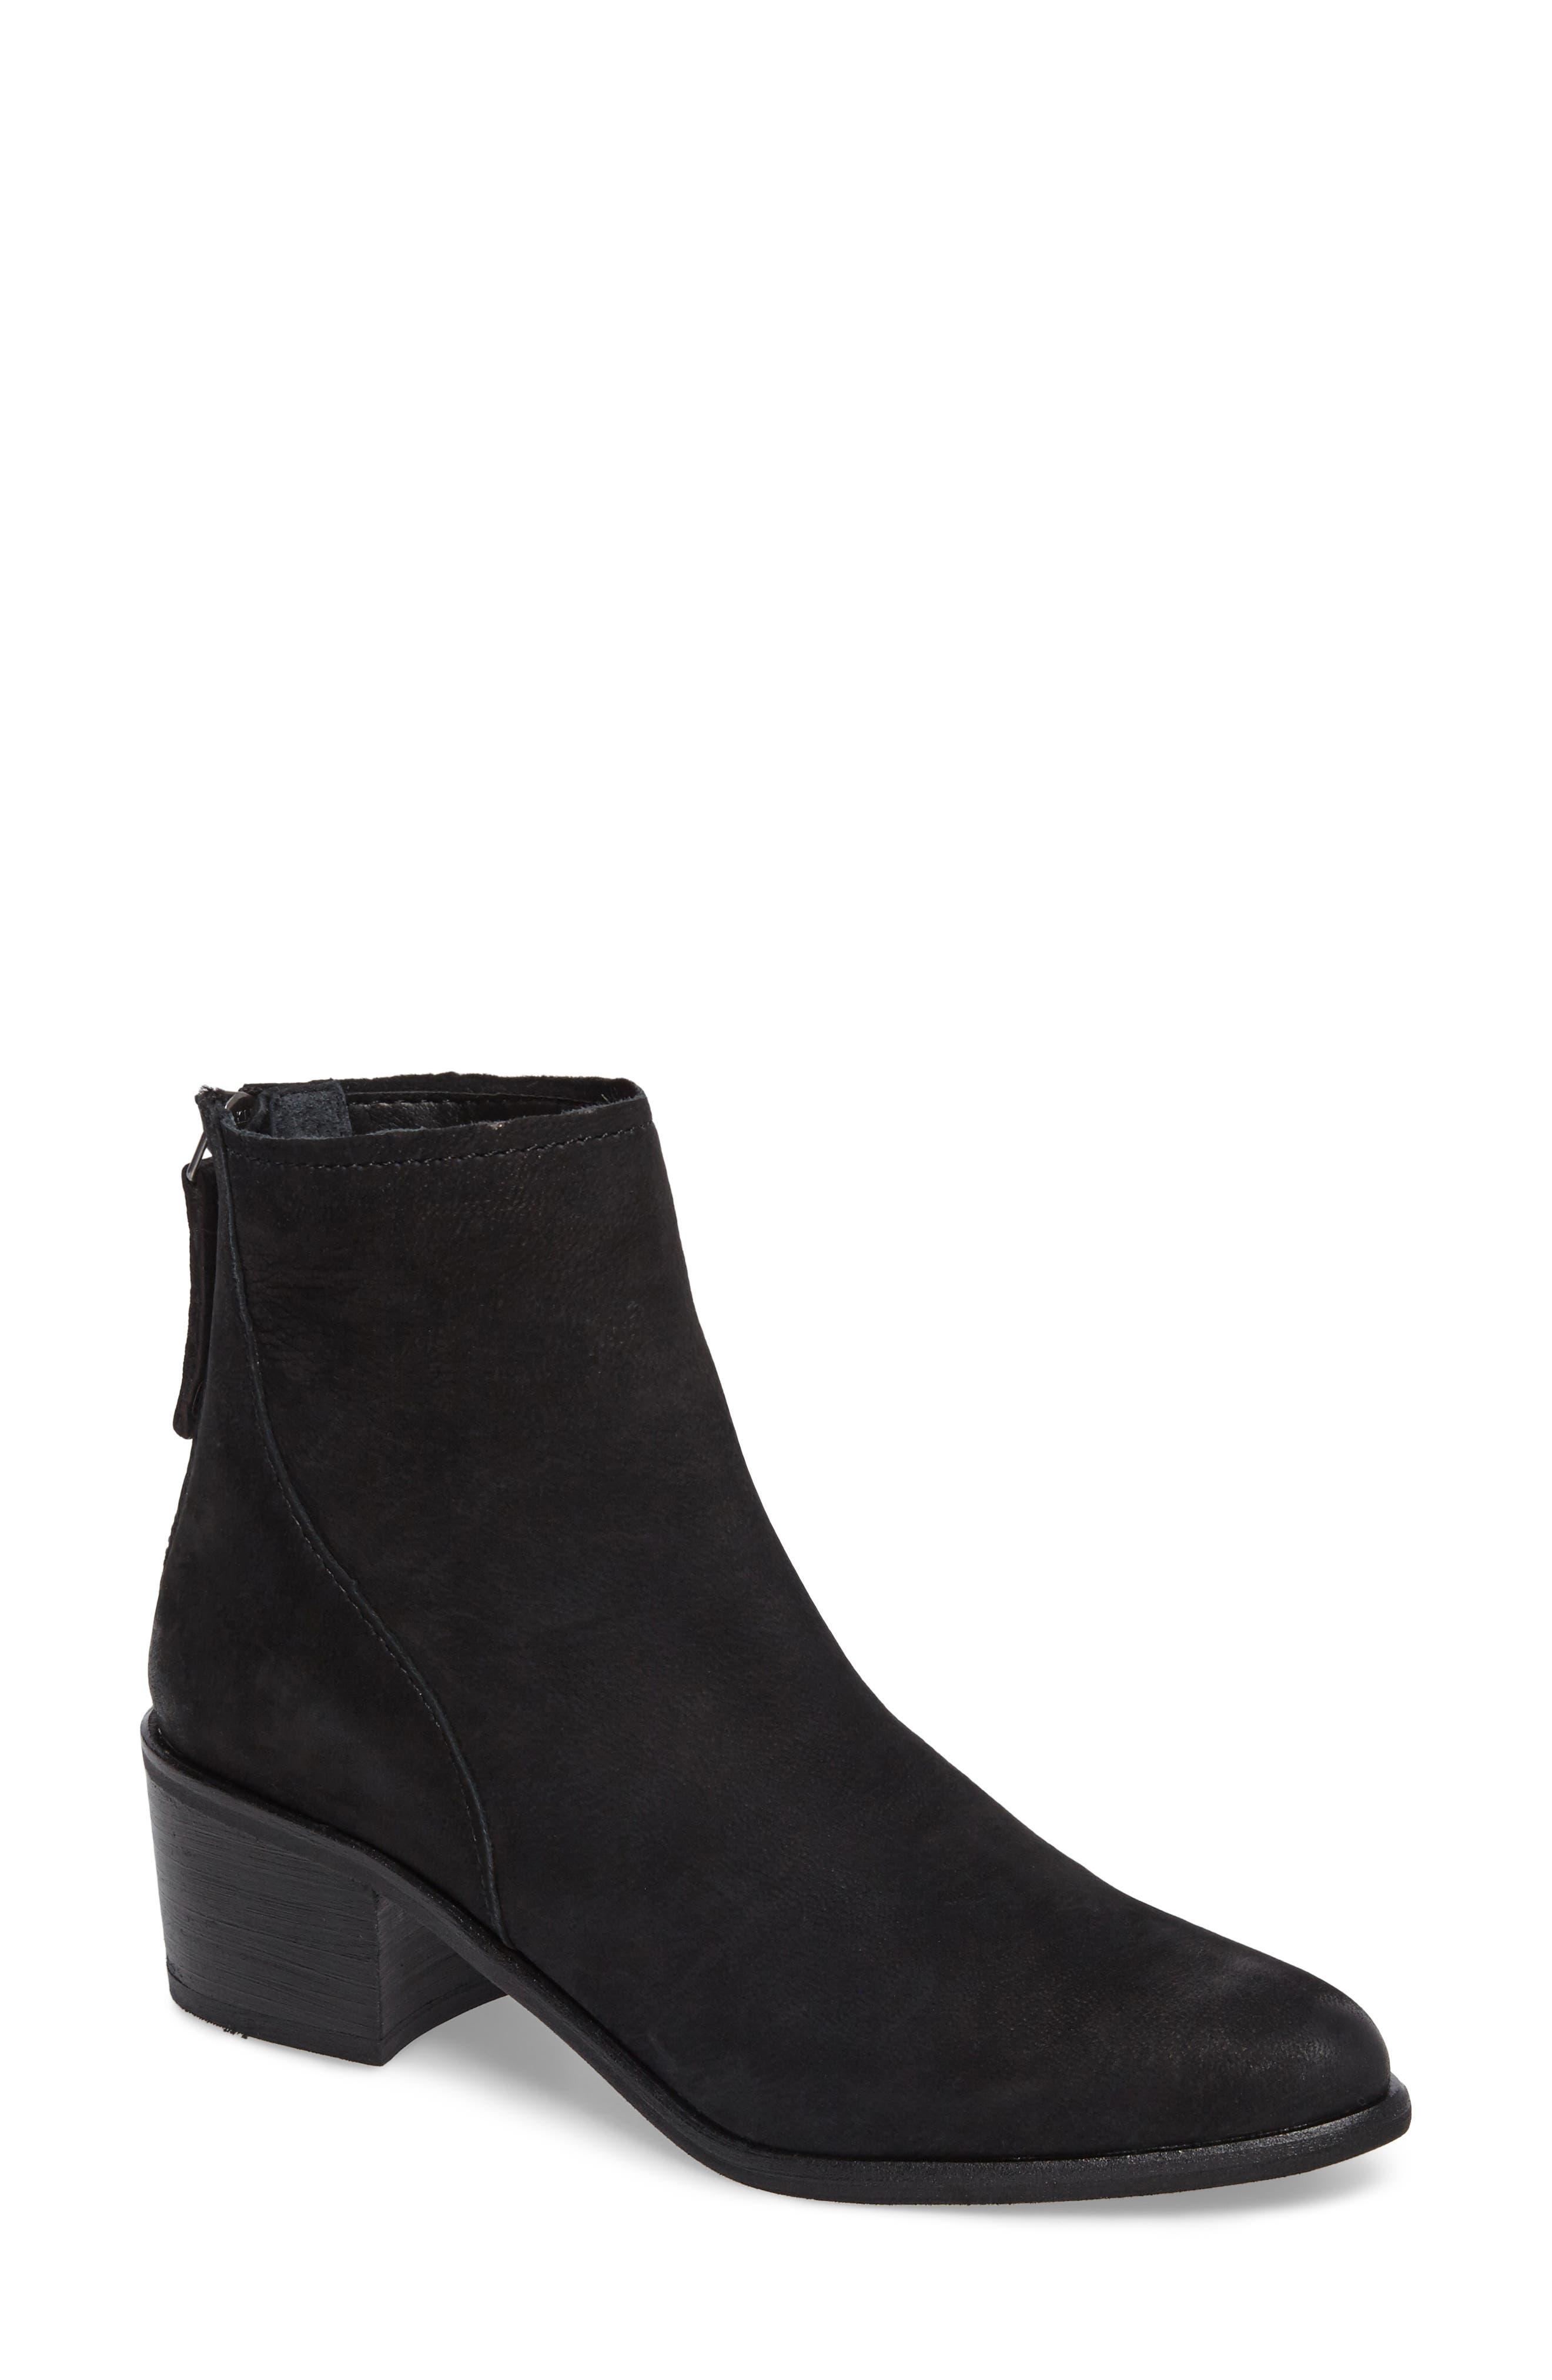 Cassius Block Heel Bootie,                         Main,                         color, Black Nubuck Leather